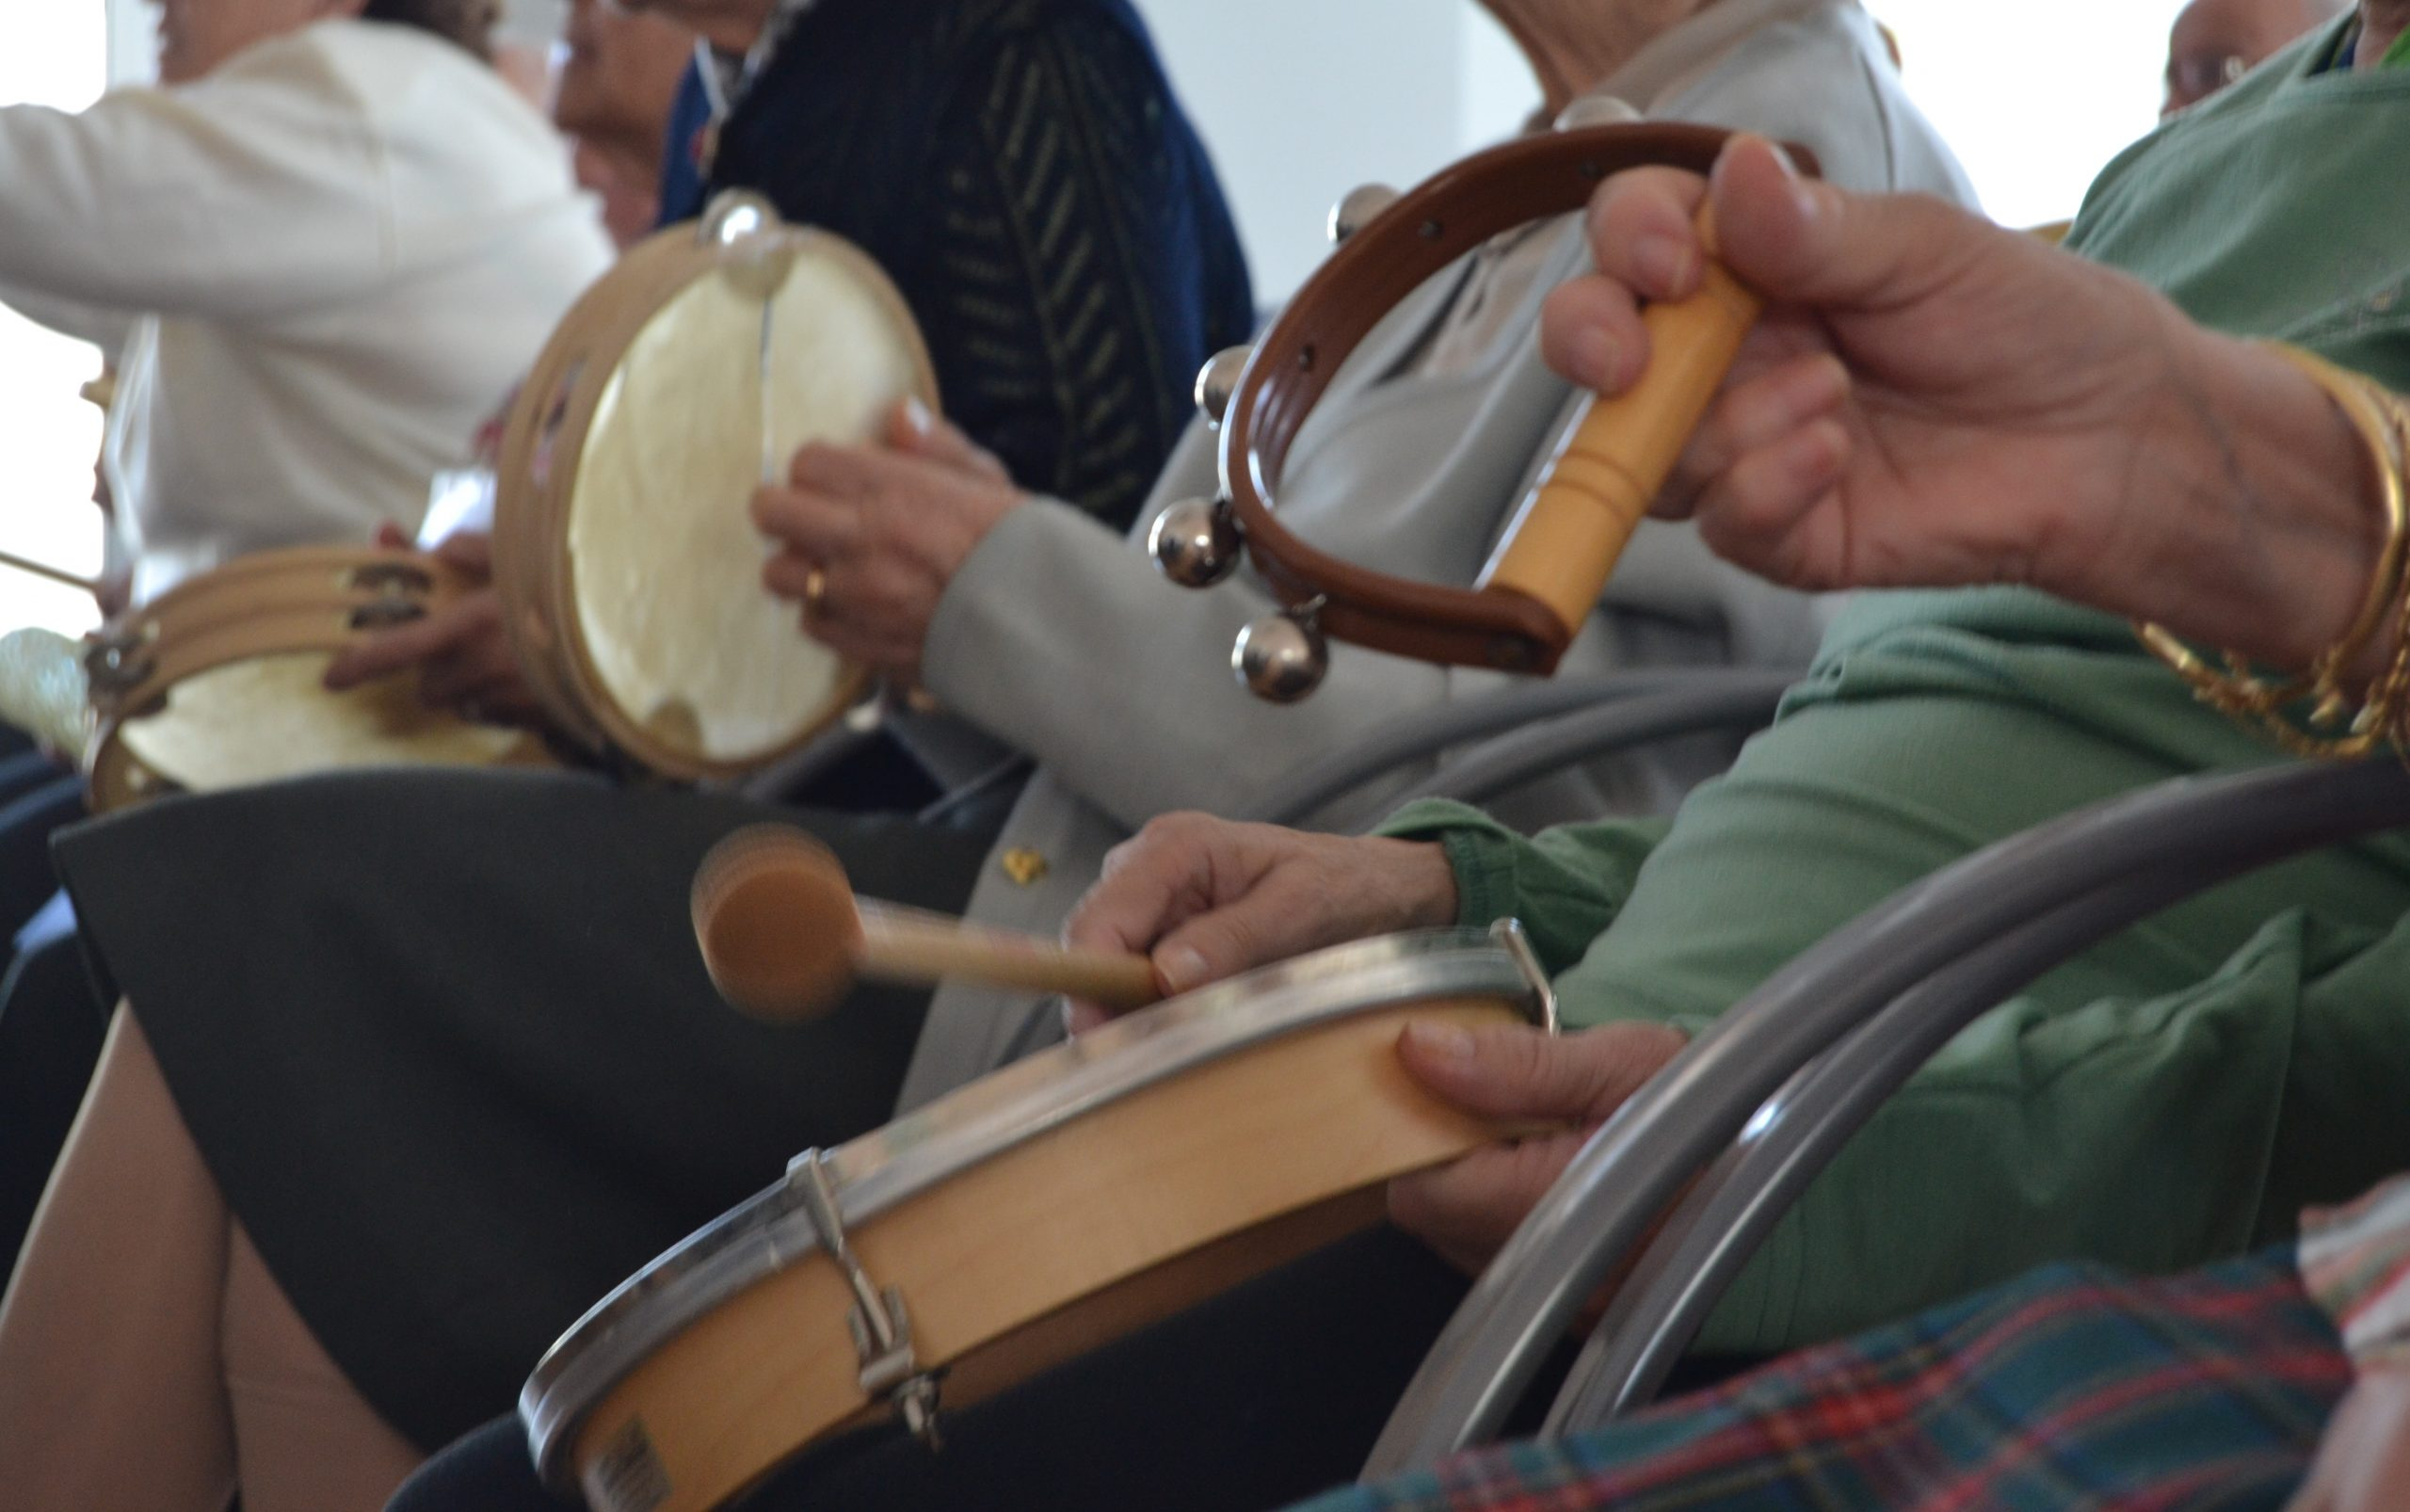 TALLER MUSICOTERAPIA scaled - Iniciativa de voluntariado a través de la música - Proyecto Músicamable